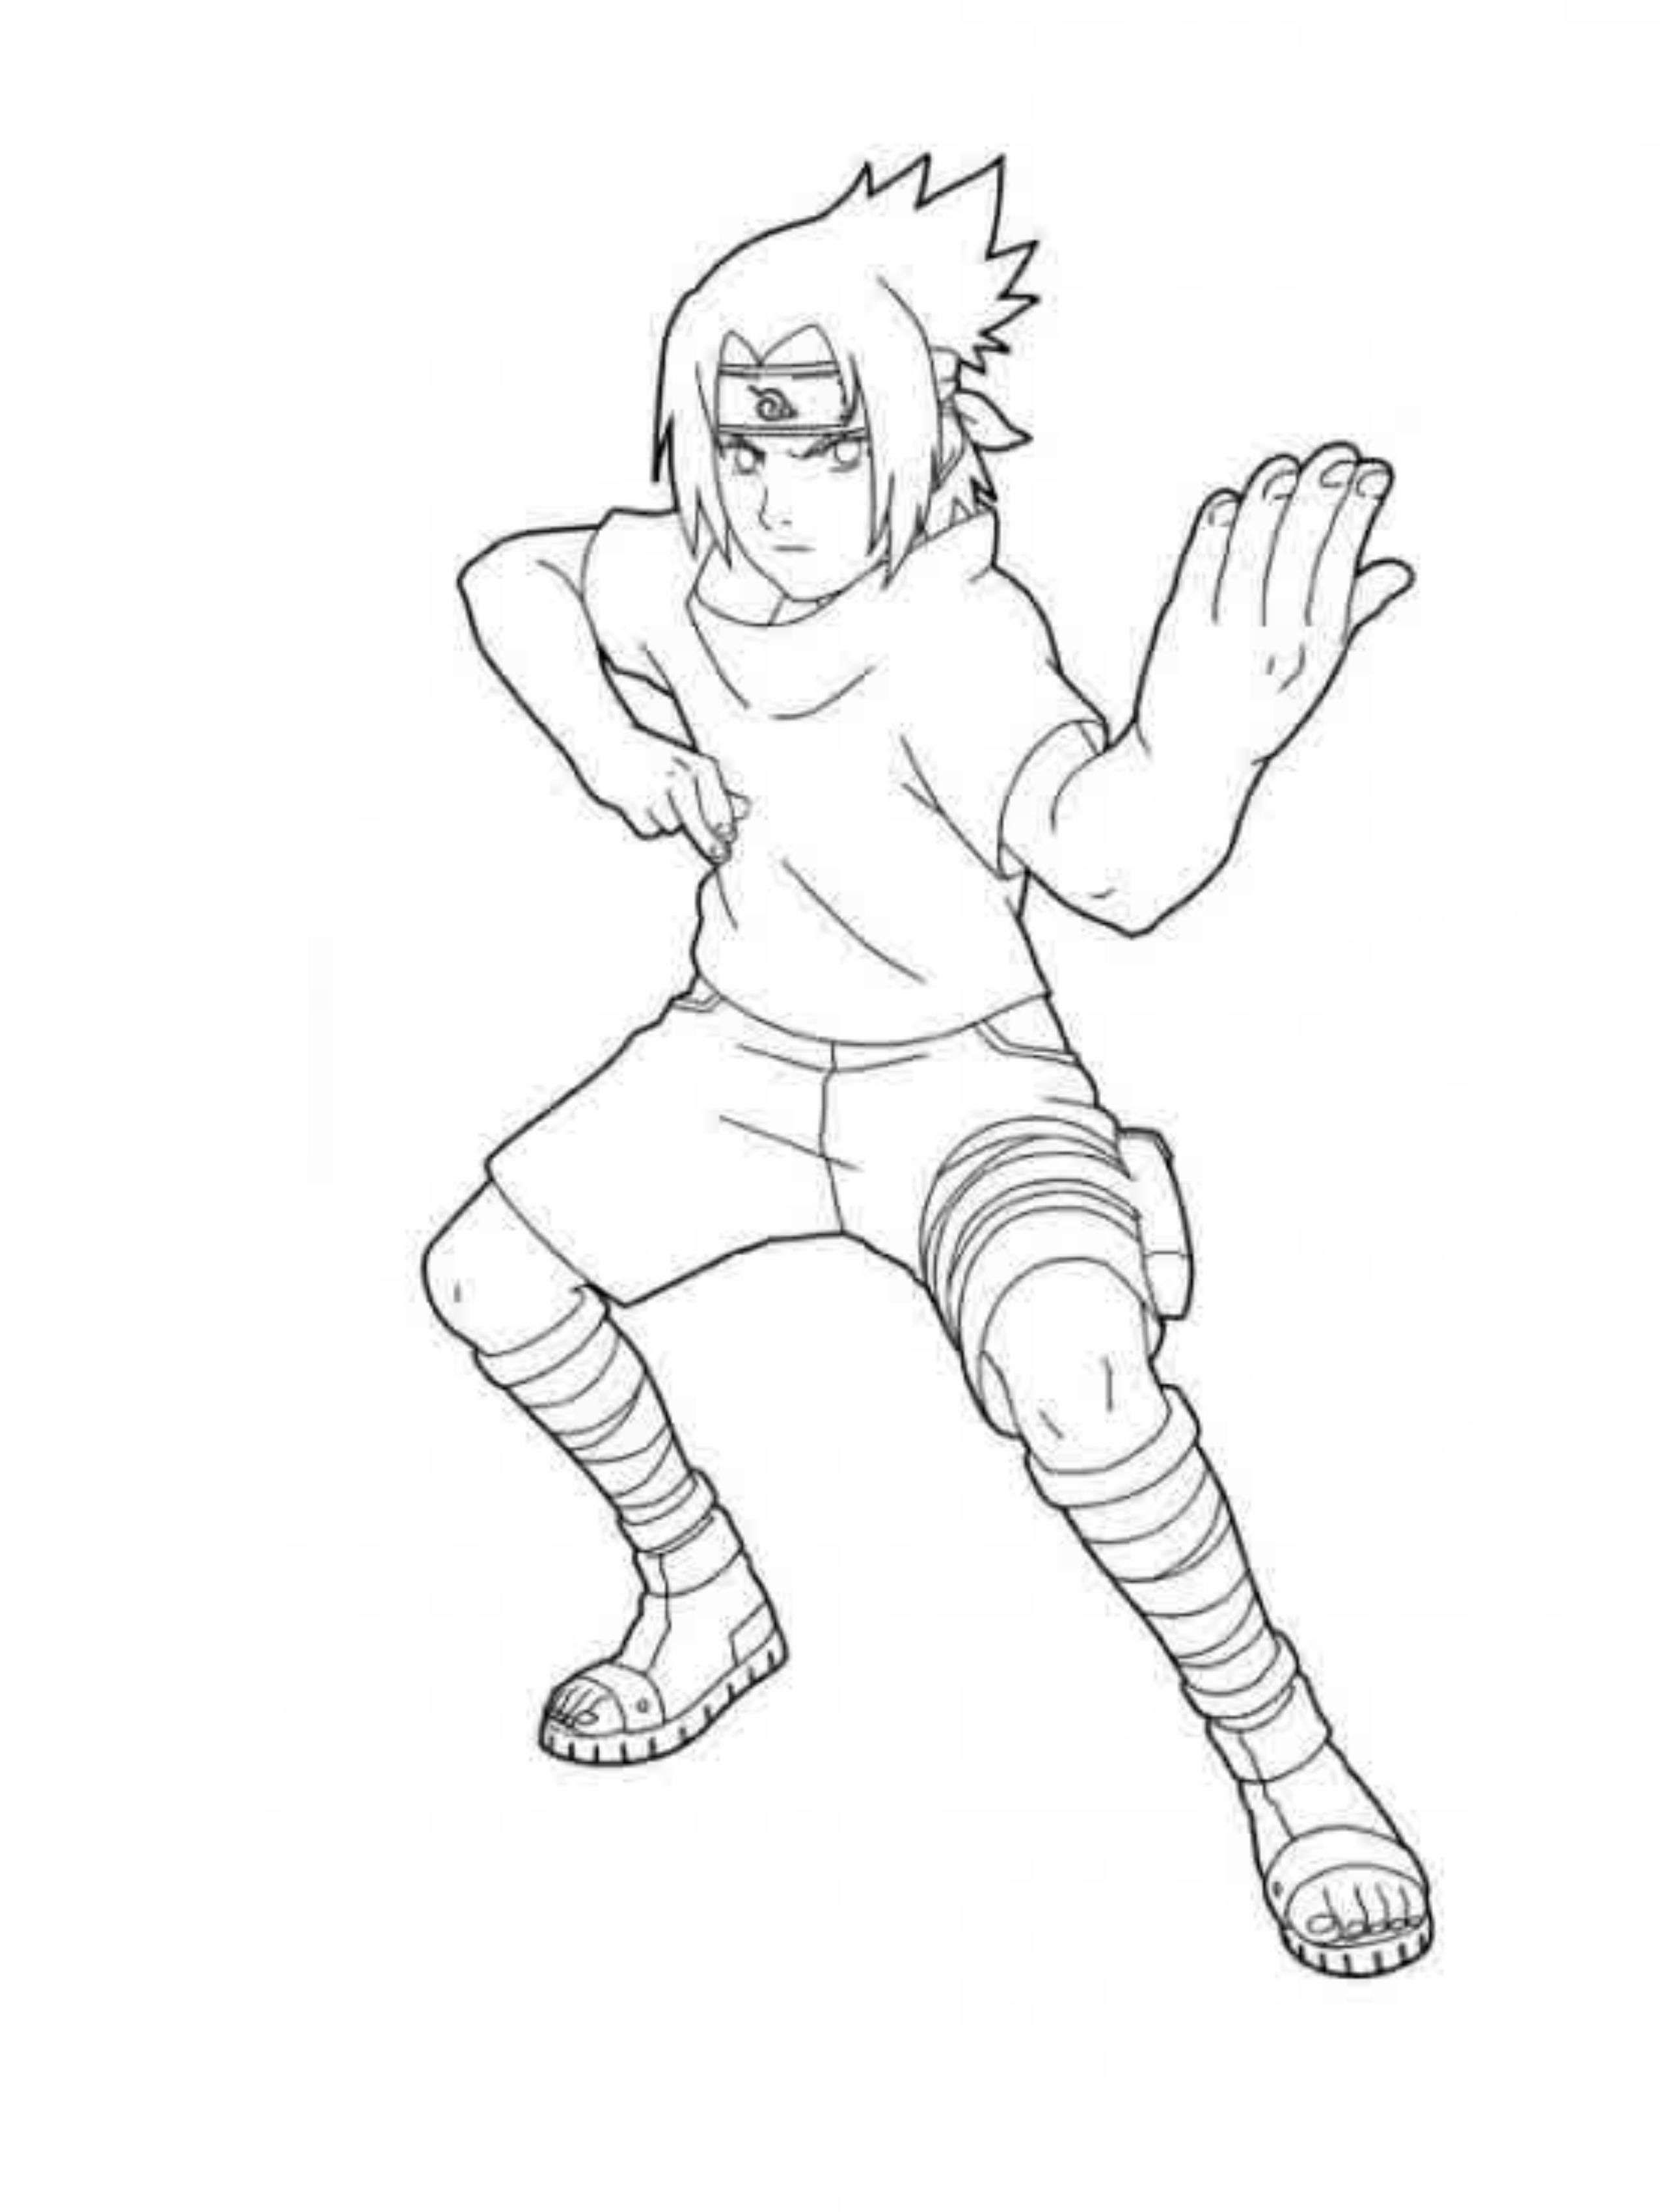 naruto sasuke coloring book pages | LineArt: Naruto | Pinterest | Sasuke